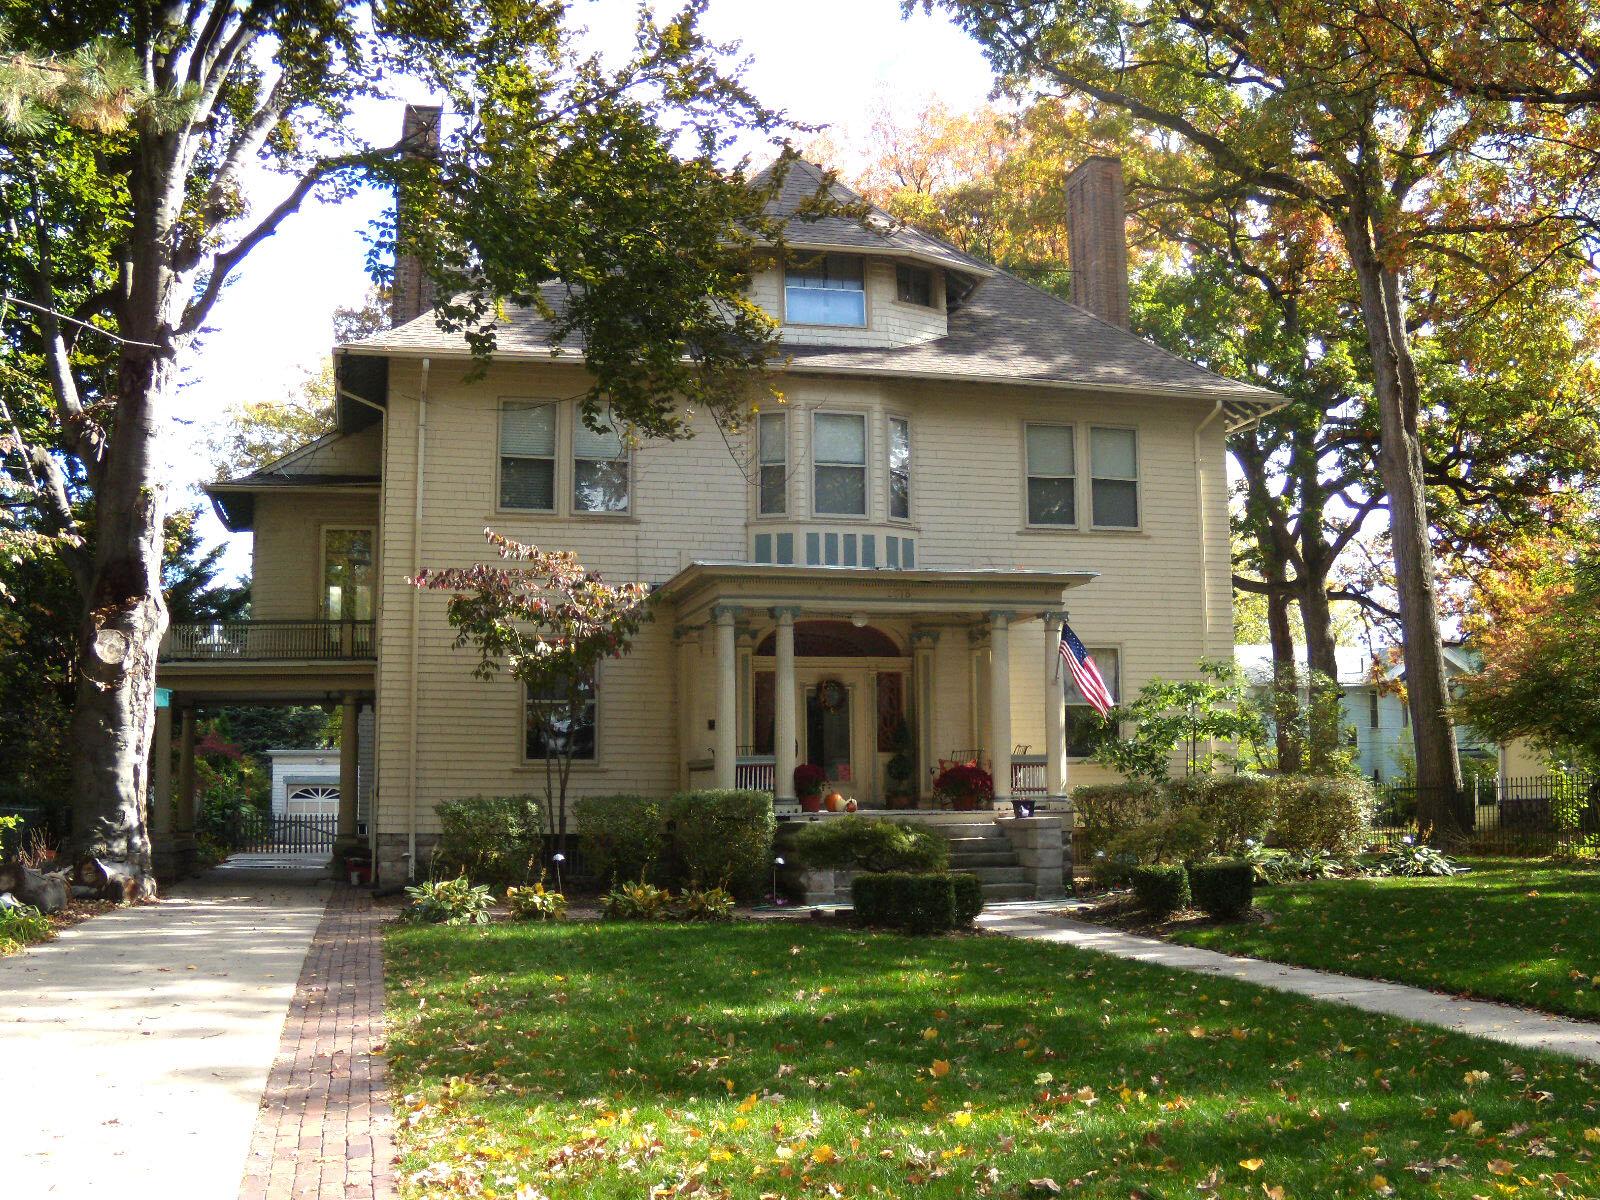 The Ferris Copeland-Shull Home 2016 Scottwood Avenue